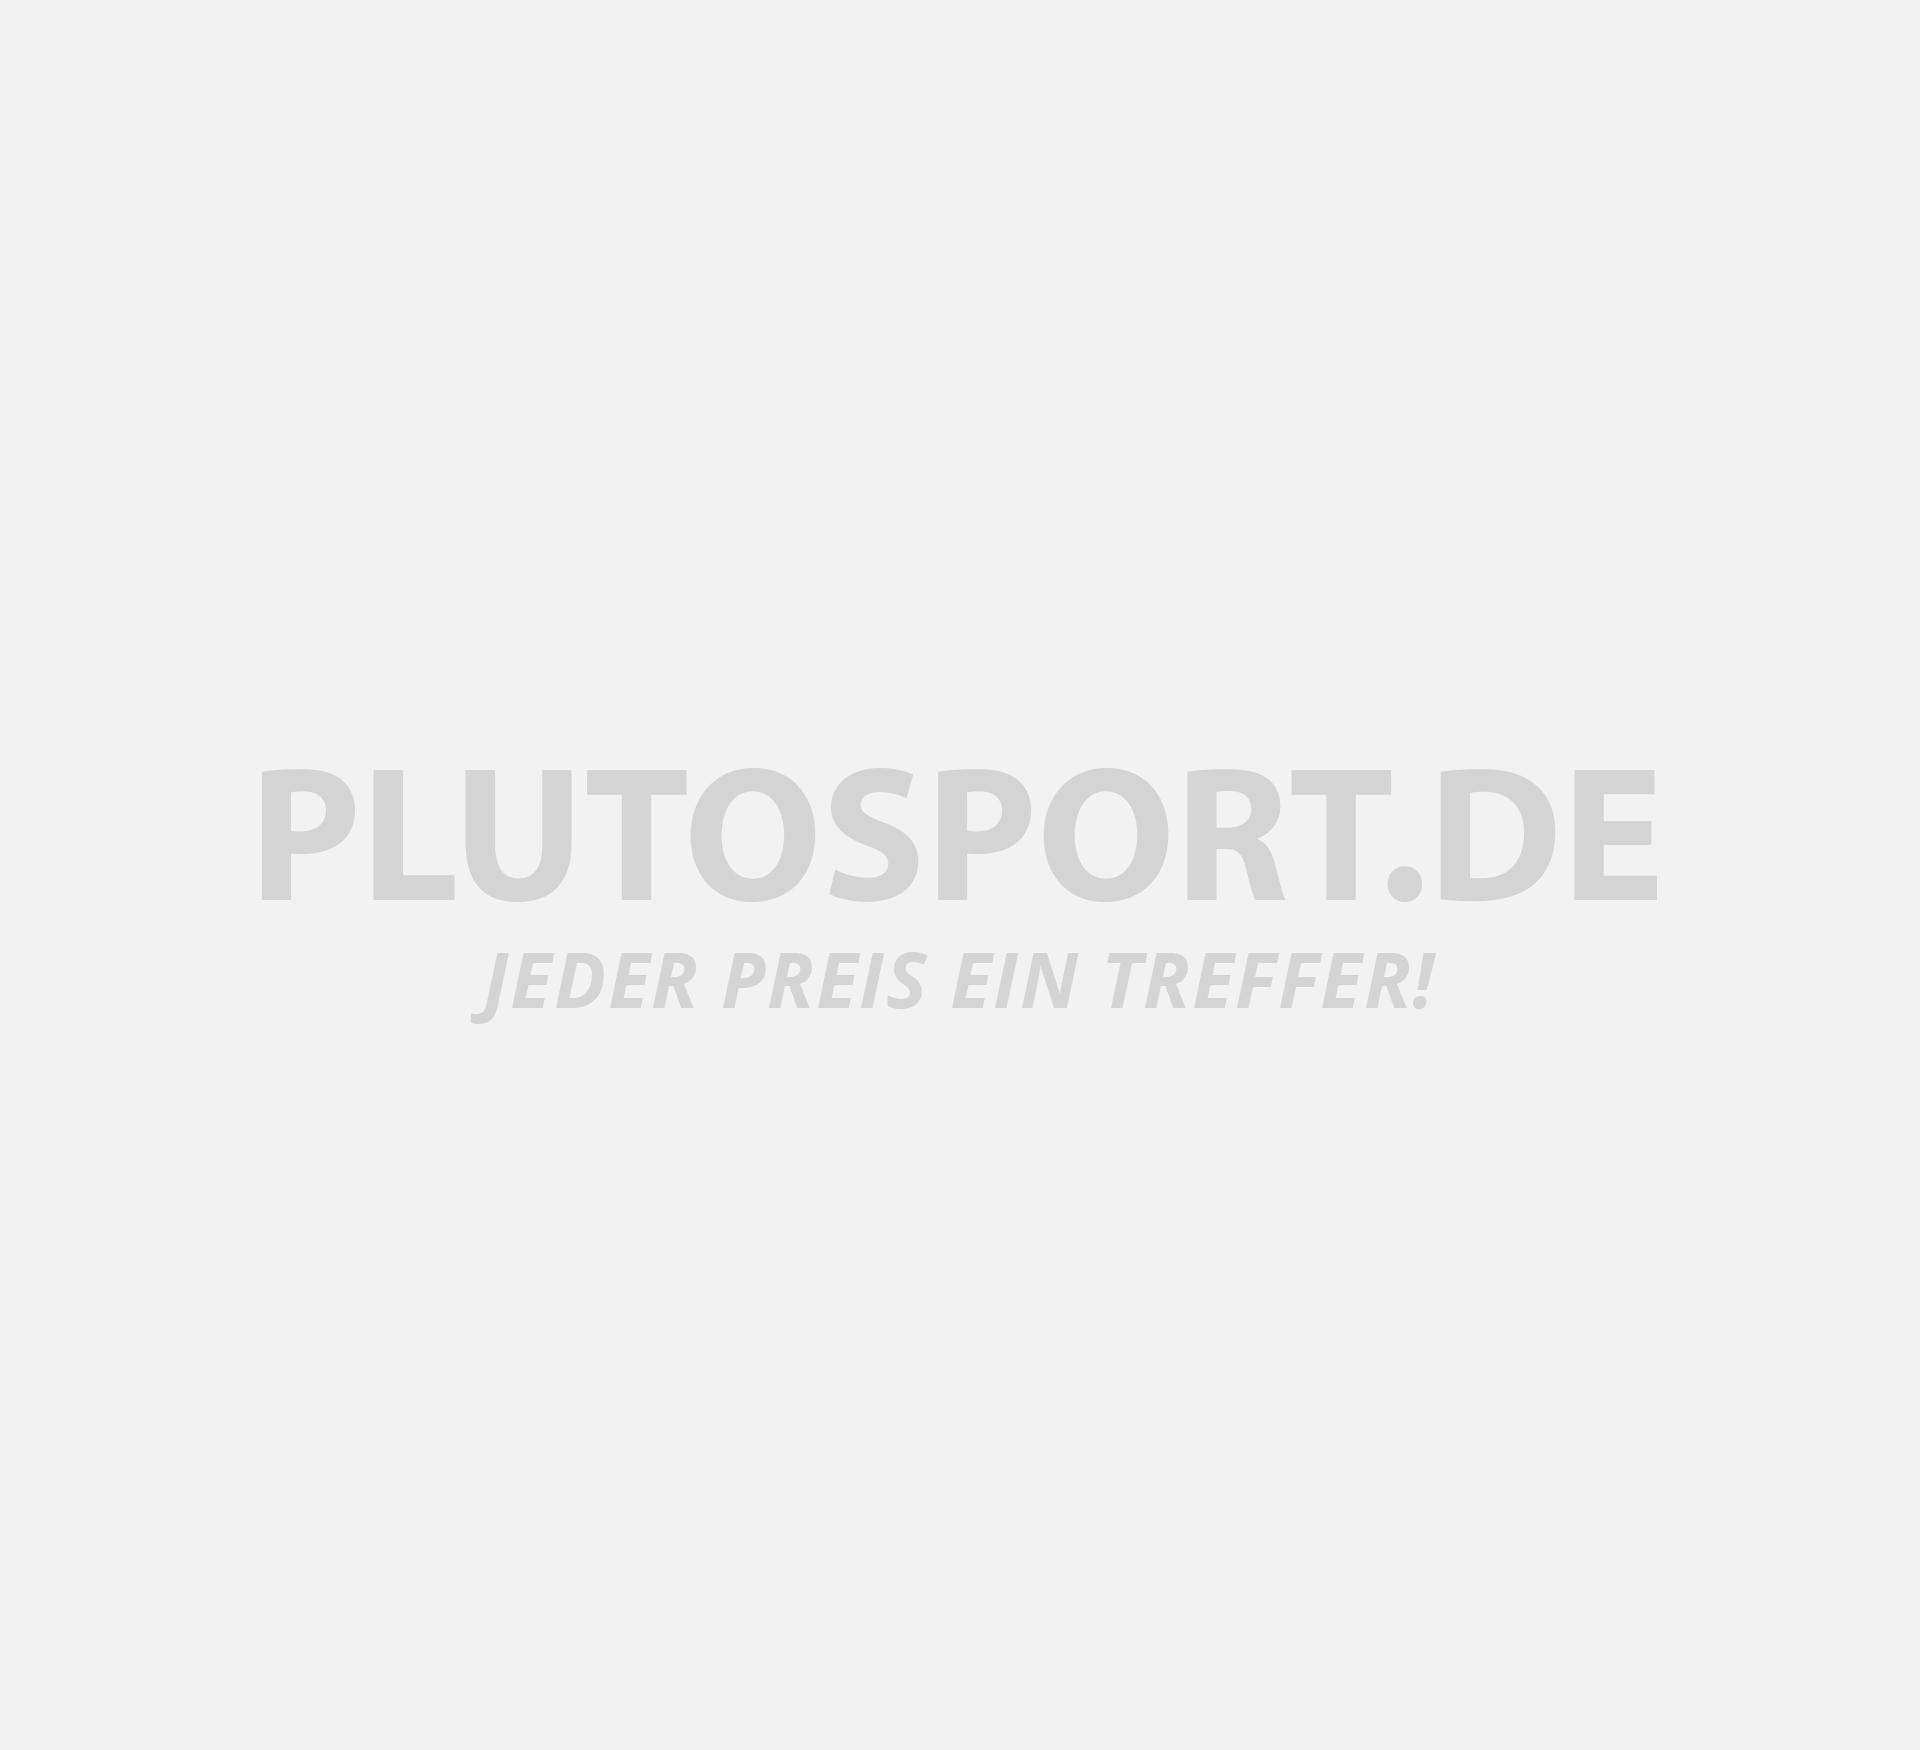 adidas judo anzug evolution ii f r kinder kleidung kleidung kampfsport sportarten. Black Bedroom Furniture Sets. Home Design Ideas